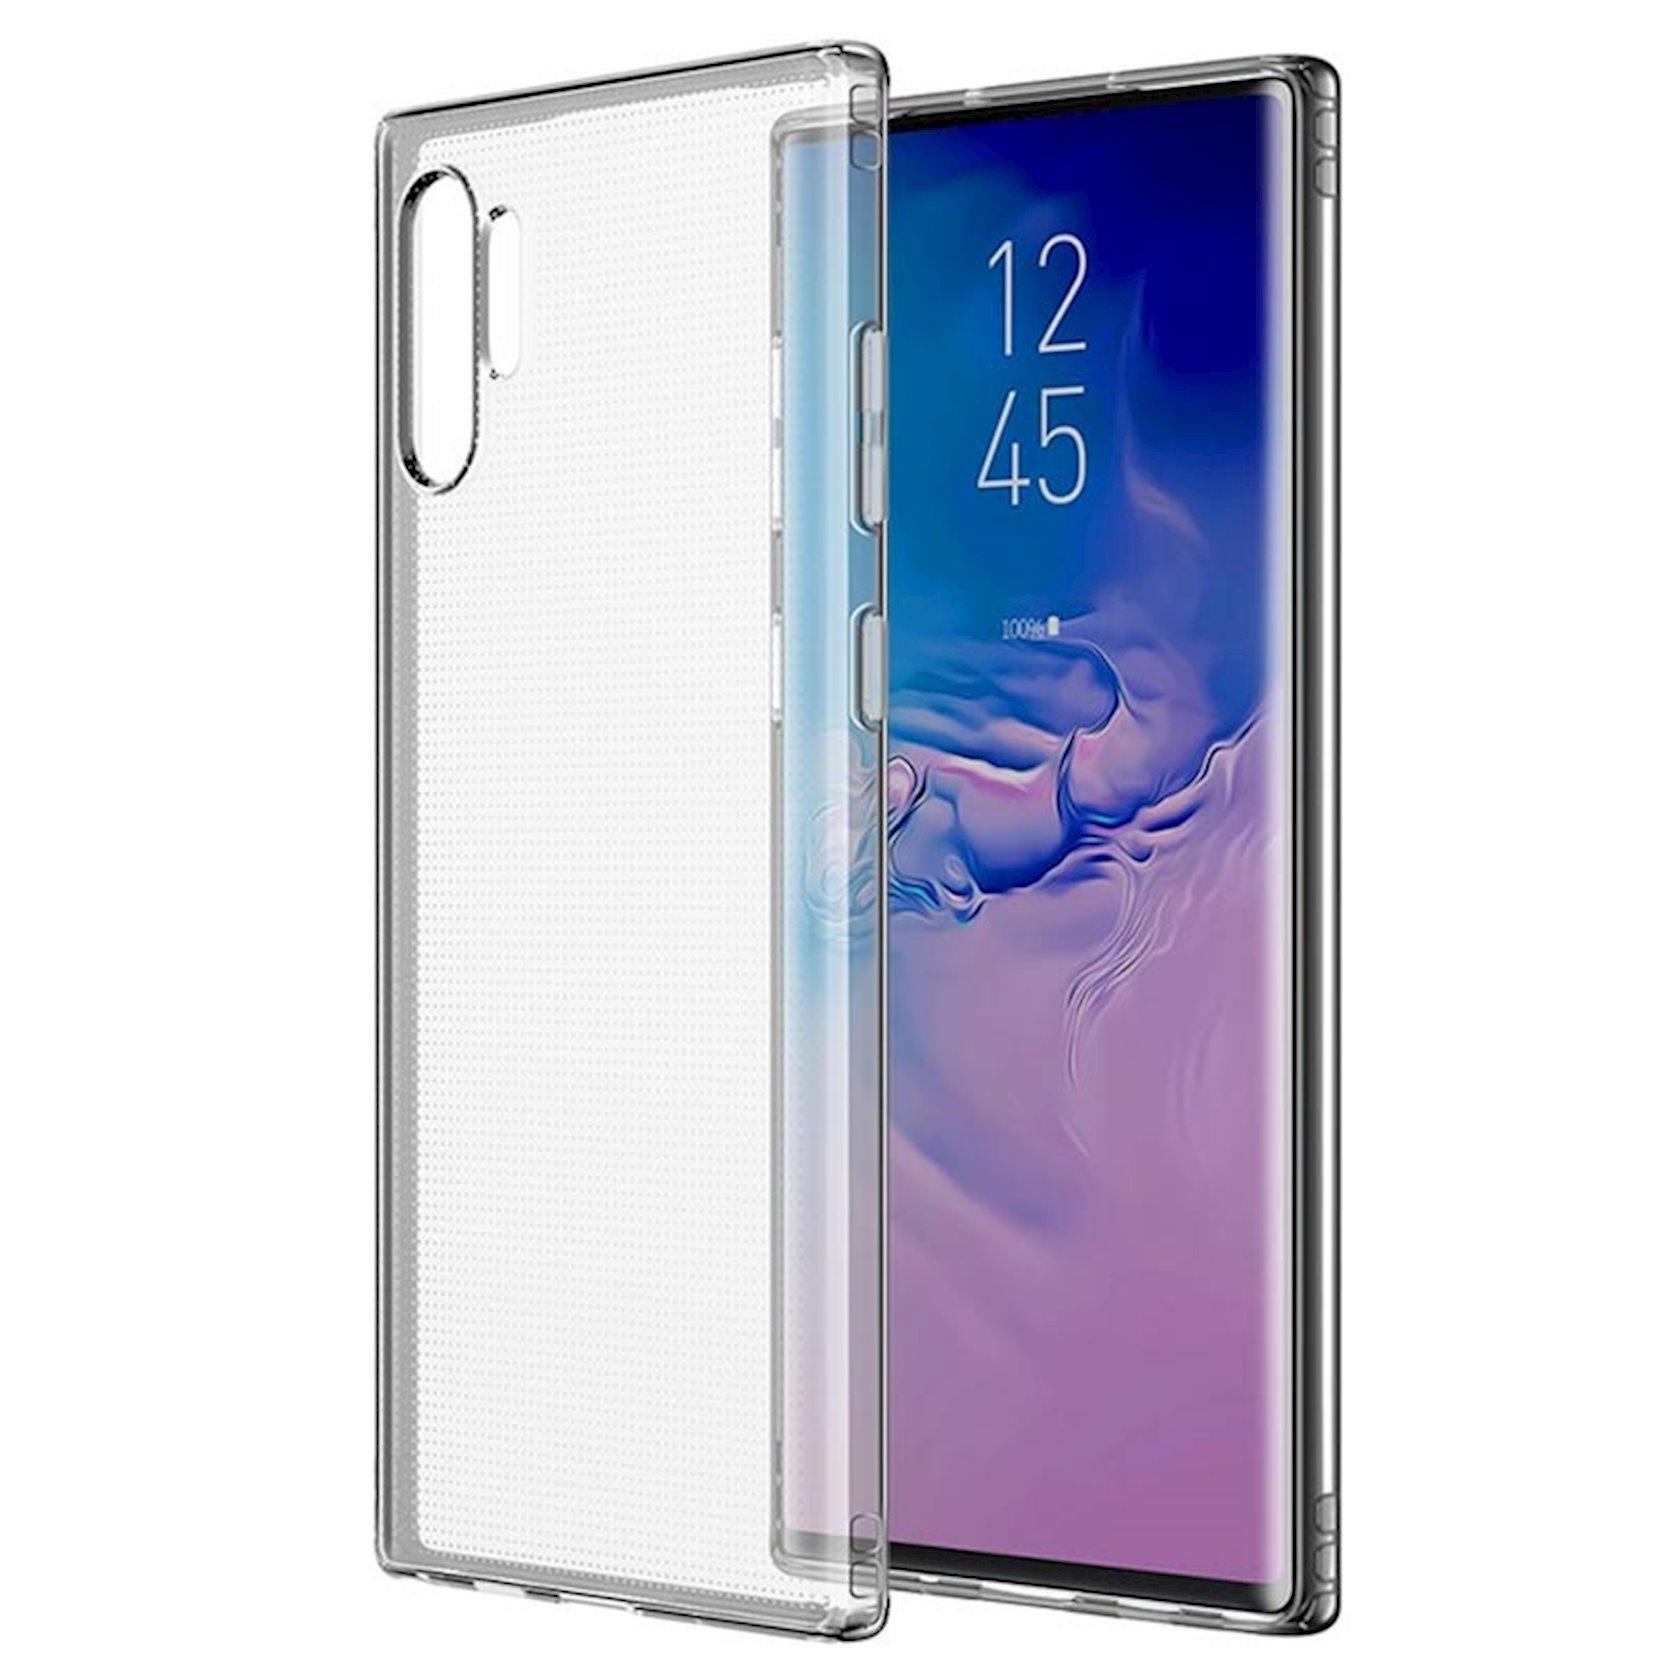 Çexol Baseus Simple Series Case Samsung Galaxy Note 10 Plus üçün